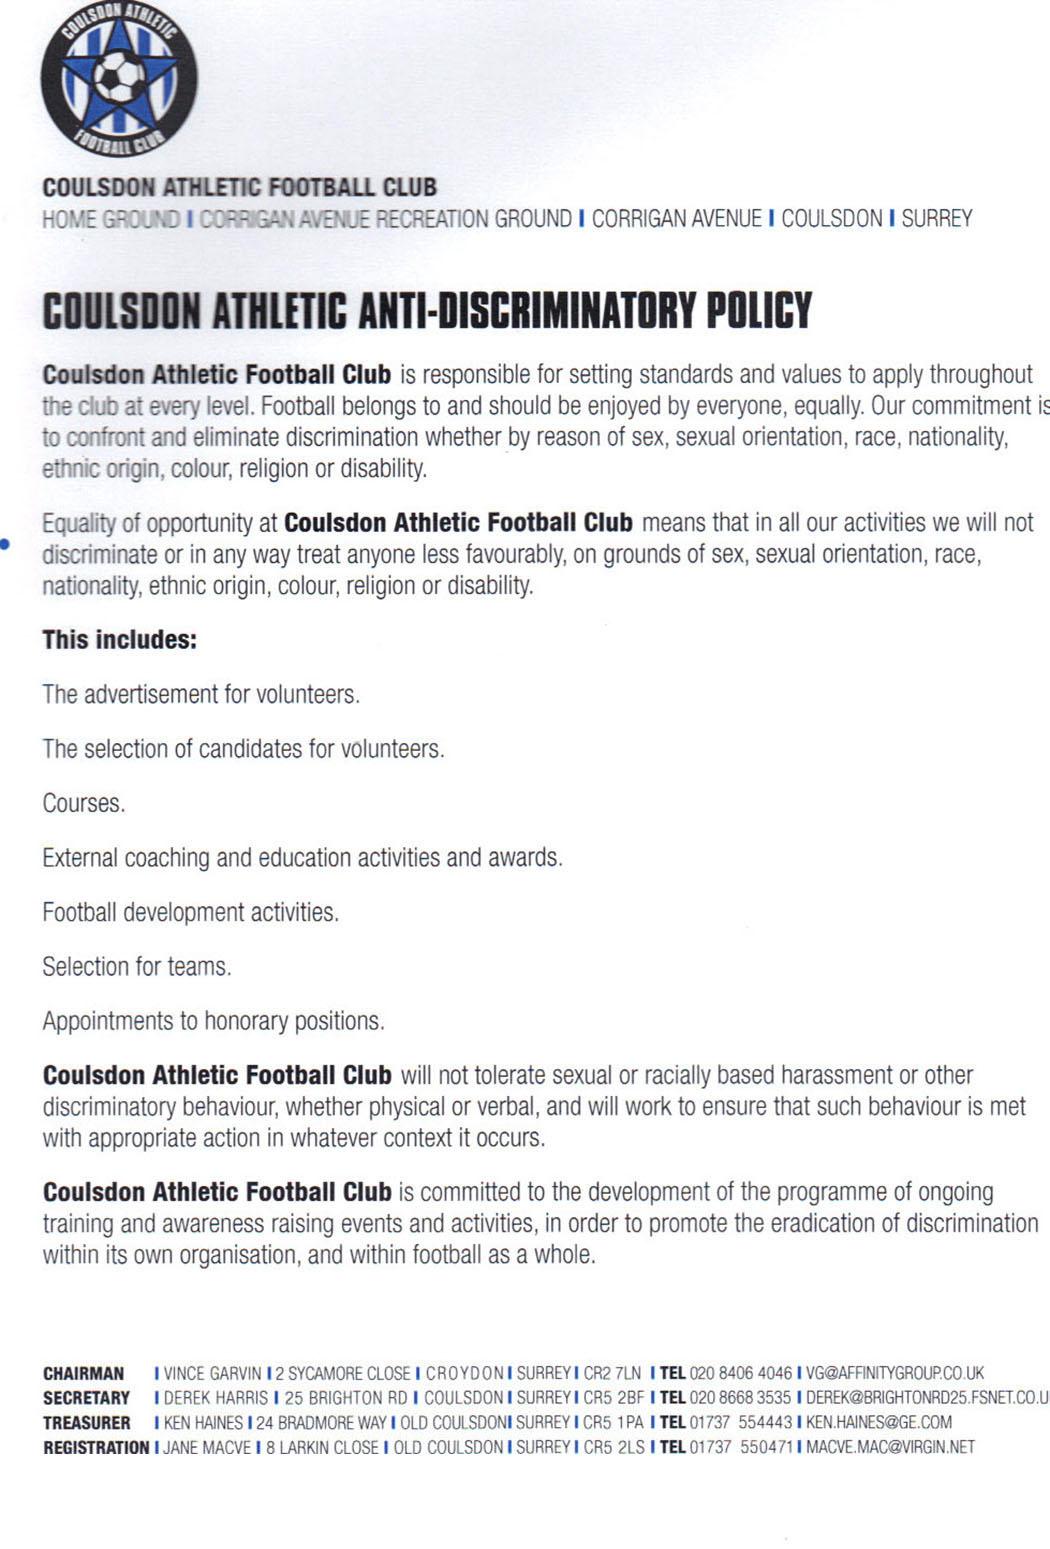 Anti discriminatory policy